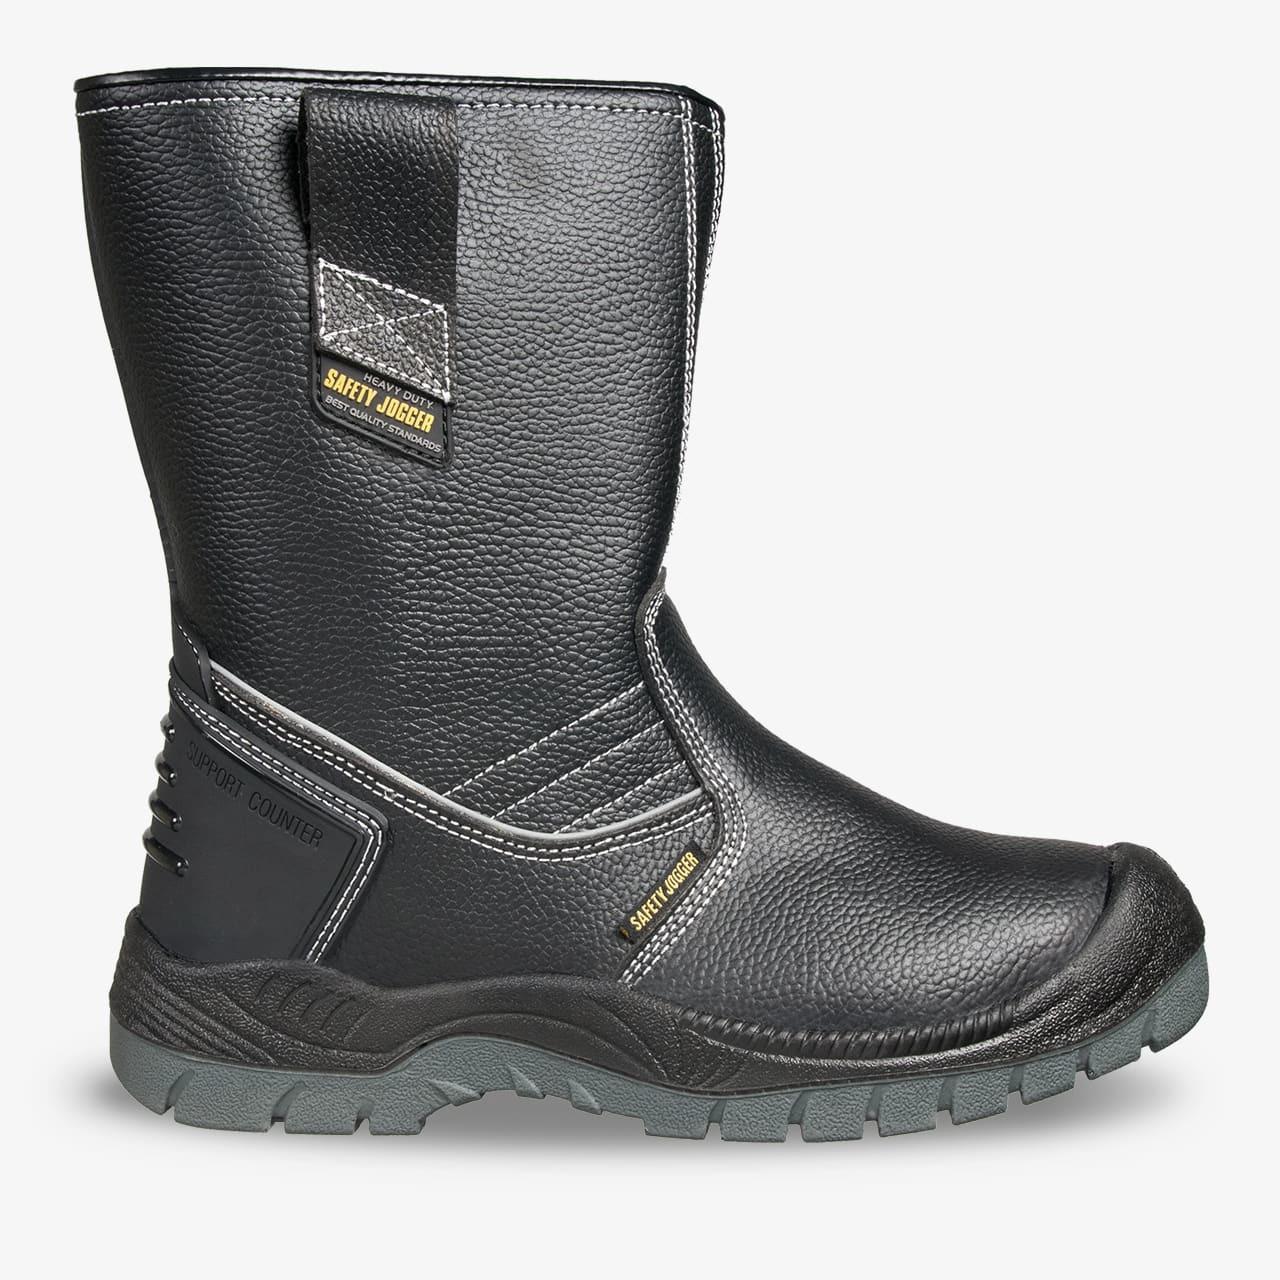 Chaussures de sécurité BESTBOOT